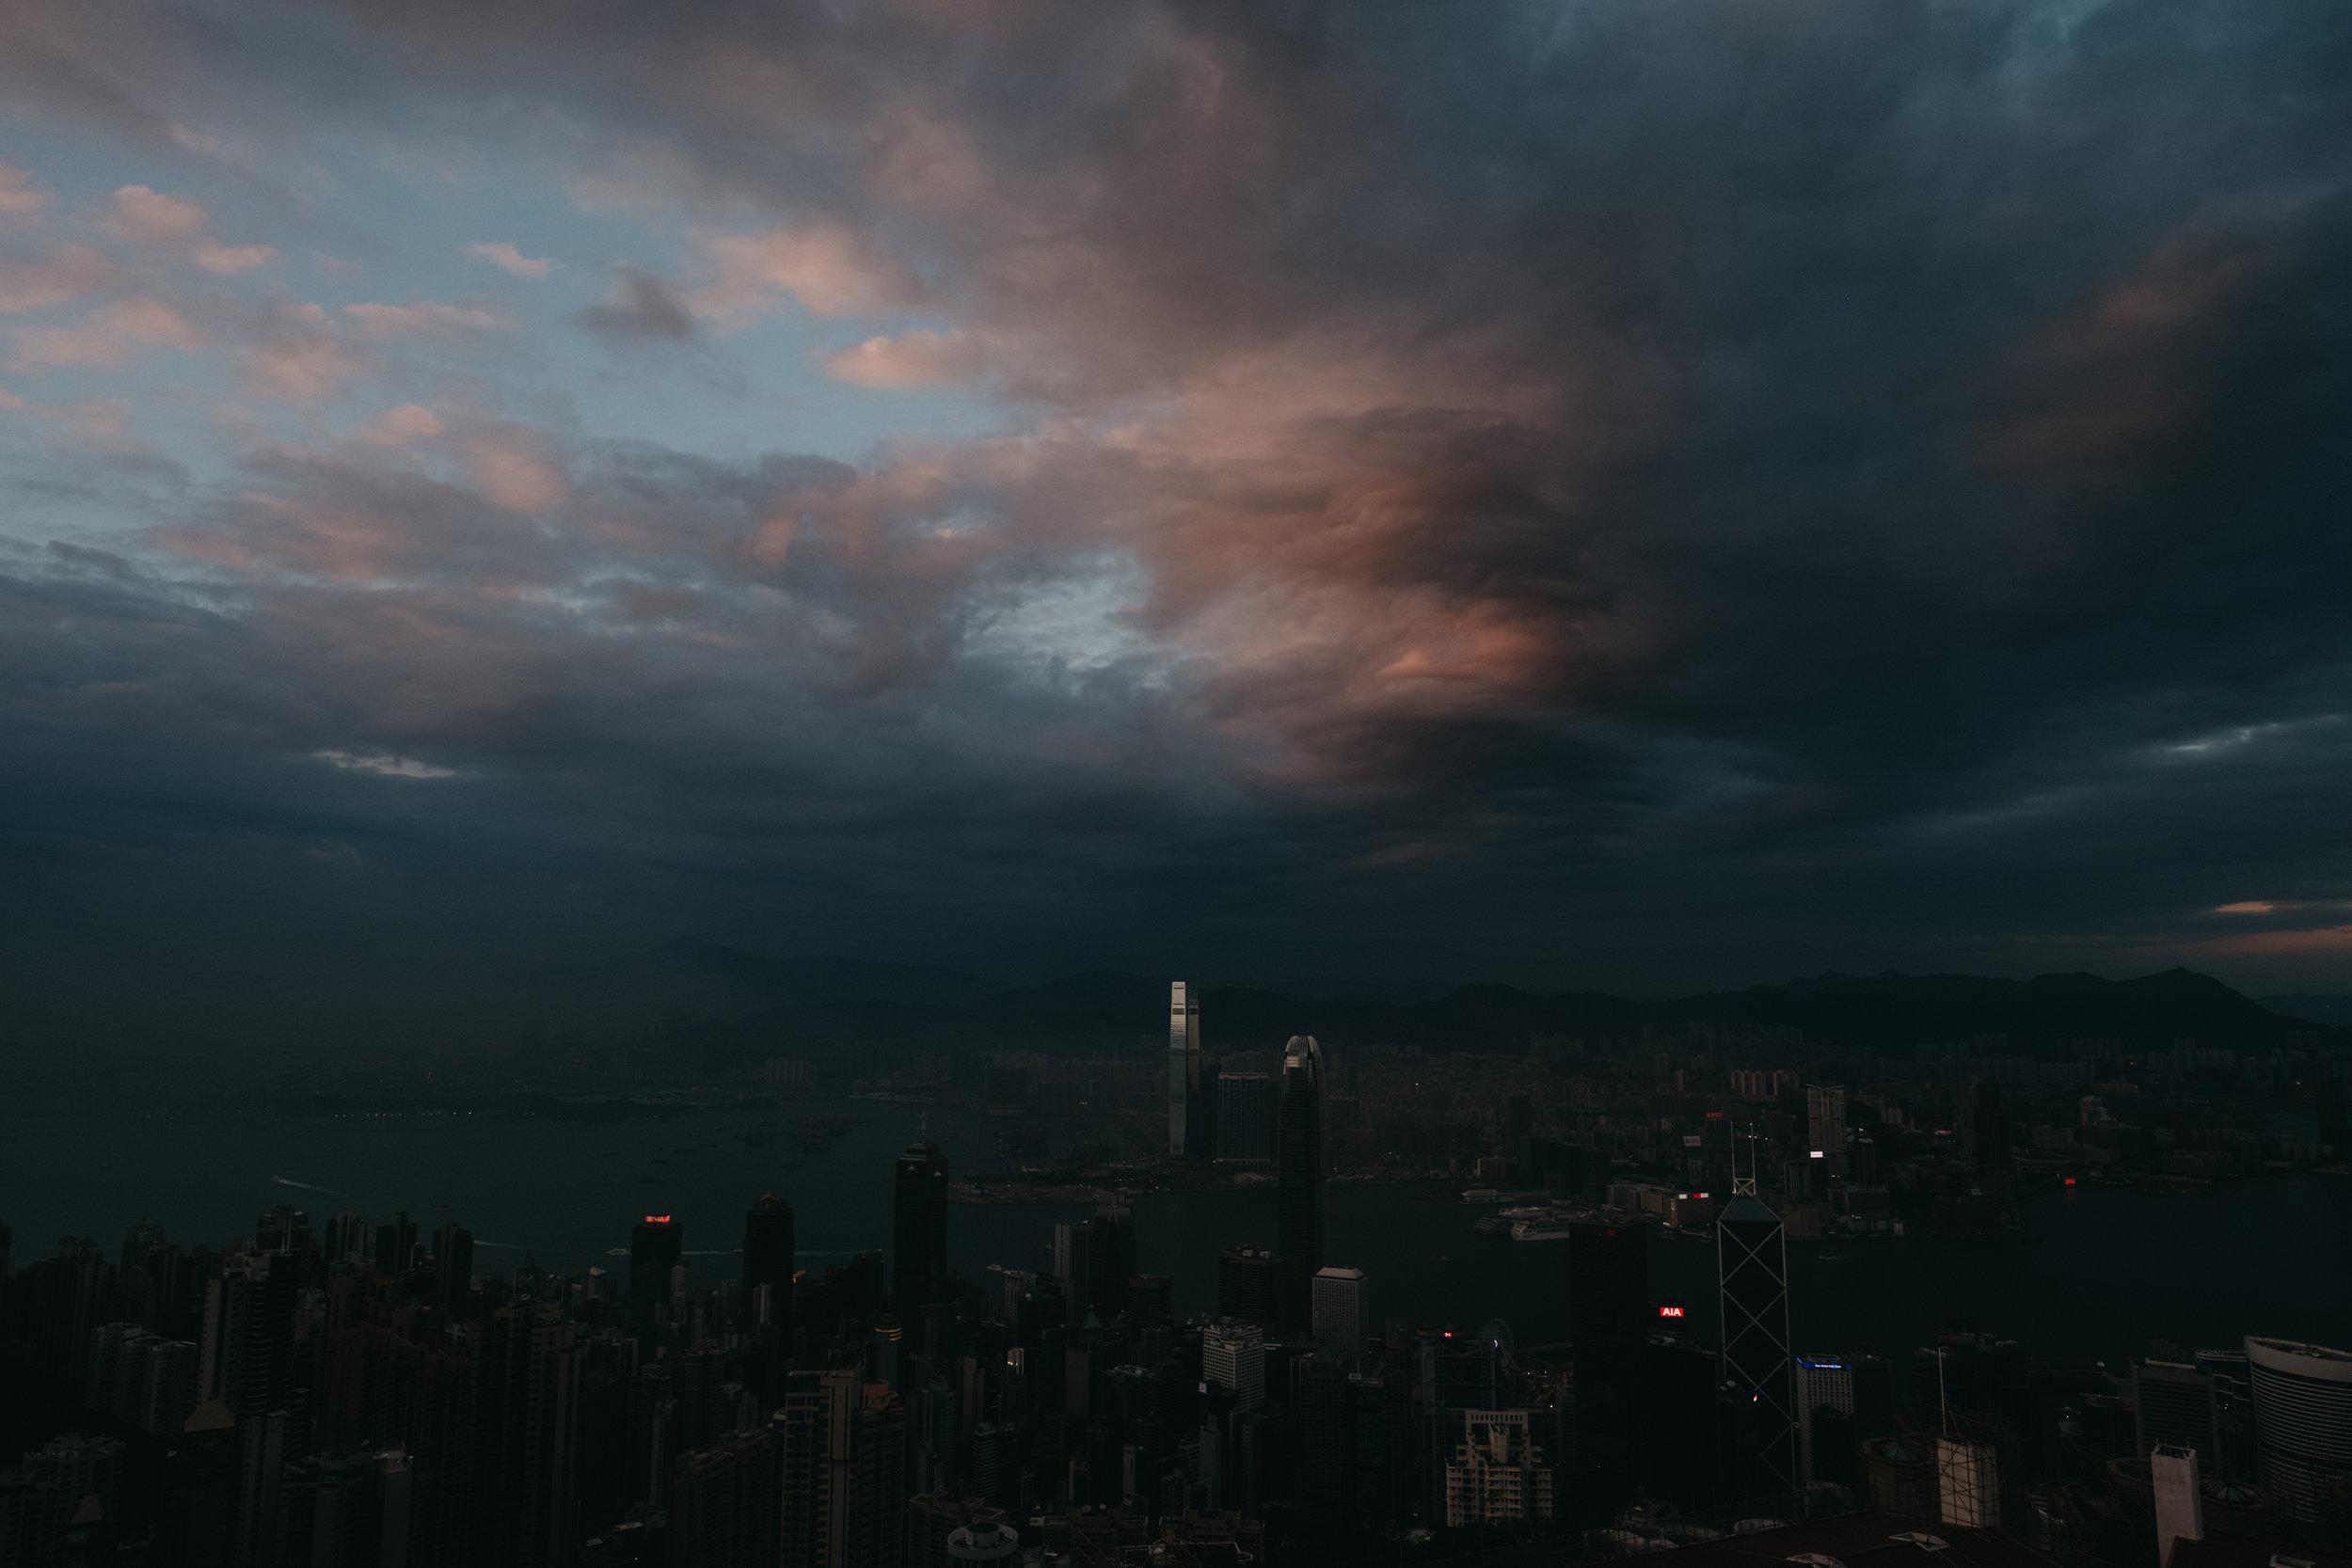 Hong Kong,  Fujifilm X-Pro2, XF 14mm f/2.8 R @ f/5.6